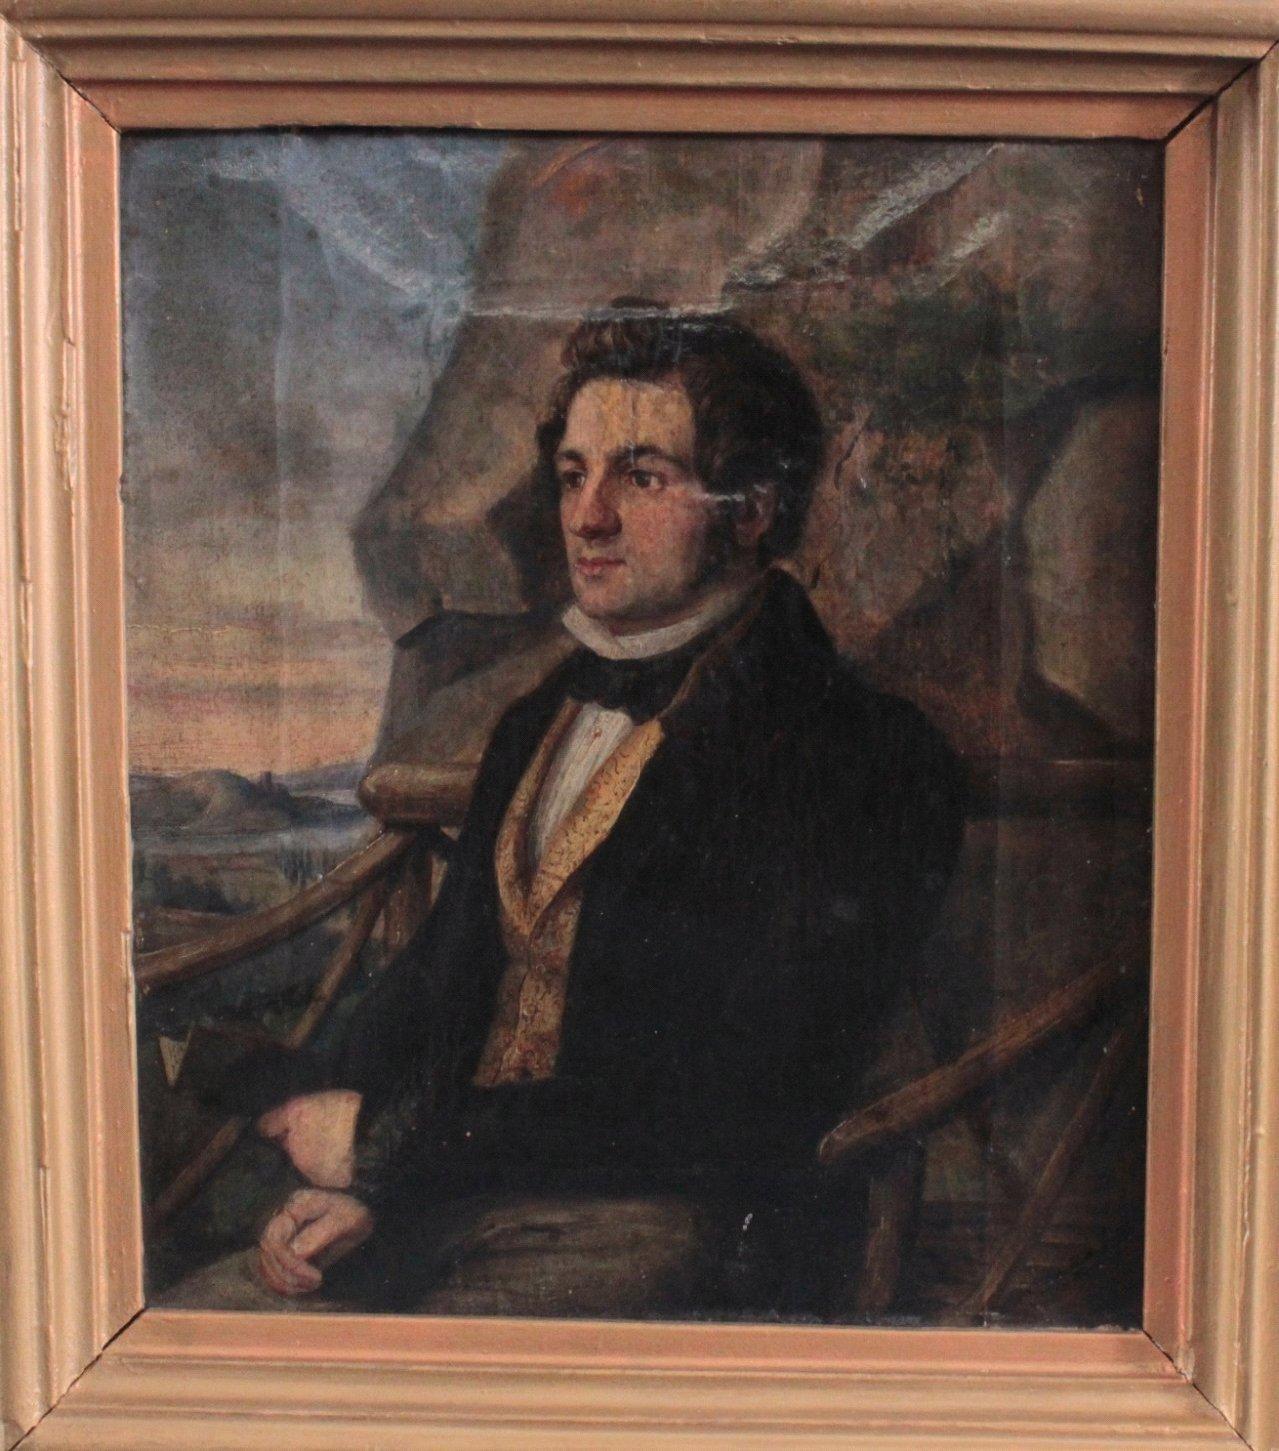 Biedermeier-Herrenporträt